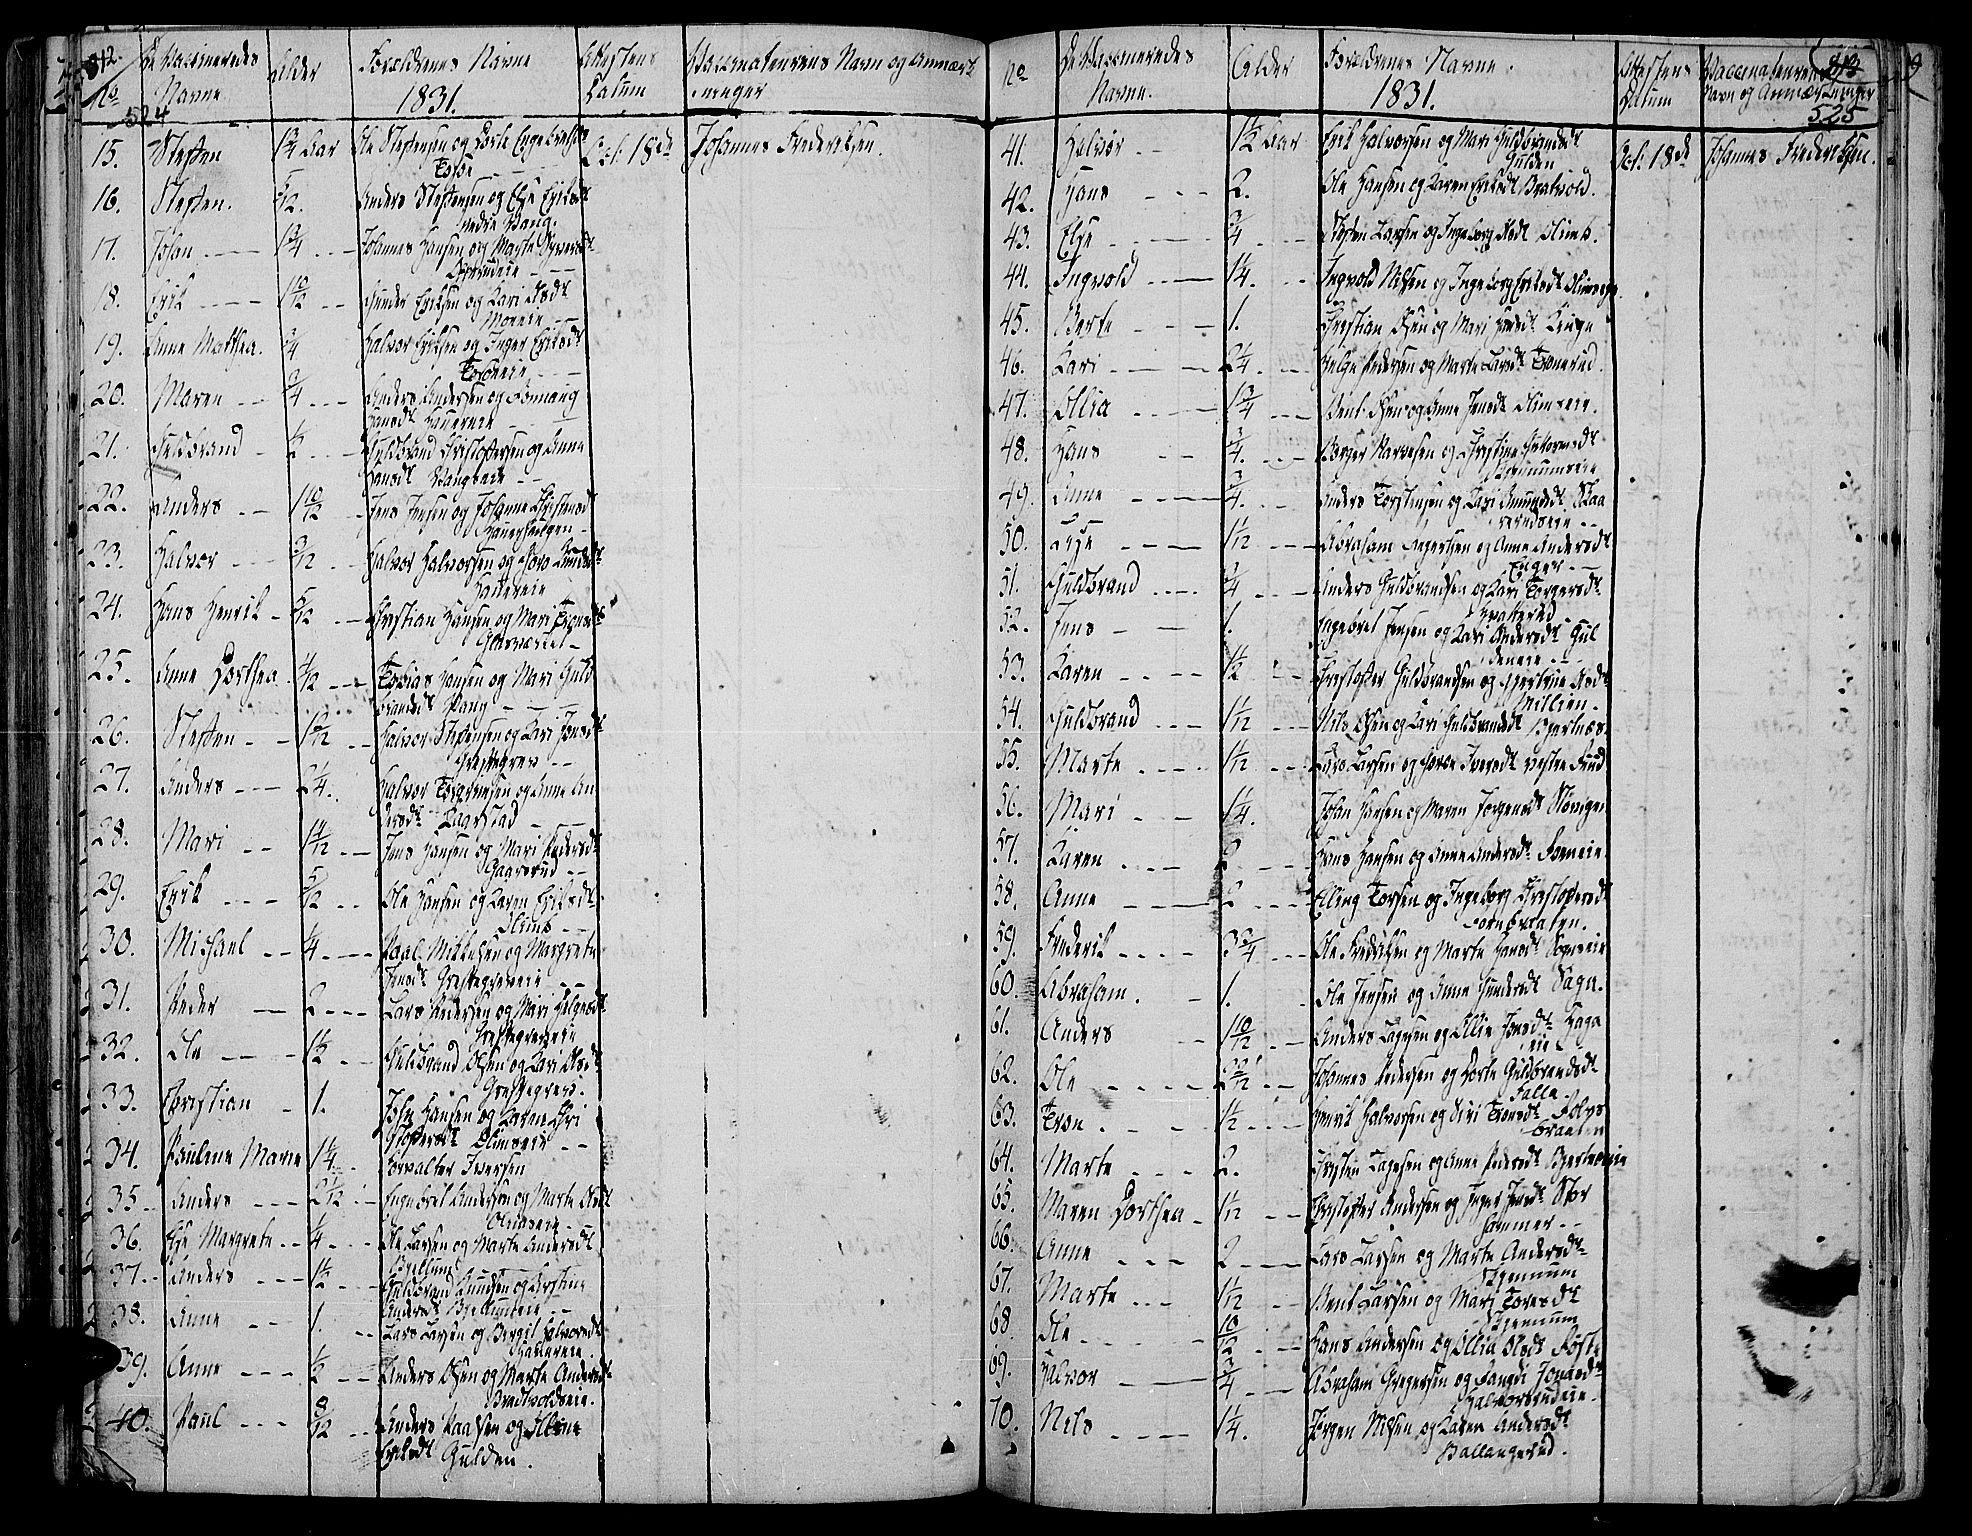 SAH, Jevnaker prestekontor, Ministerialbok nr. 4, 1800-1861, s. 524-525